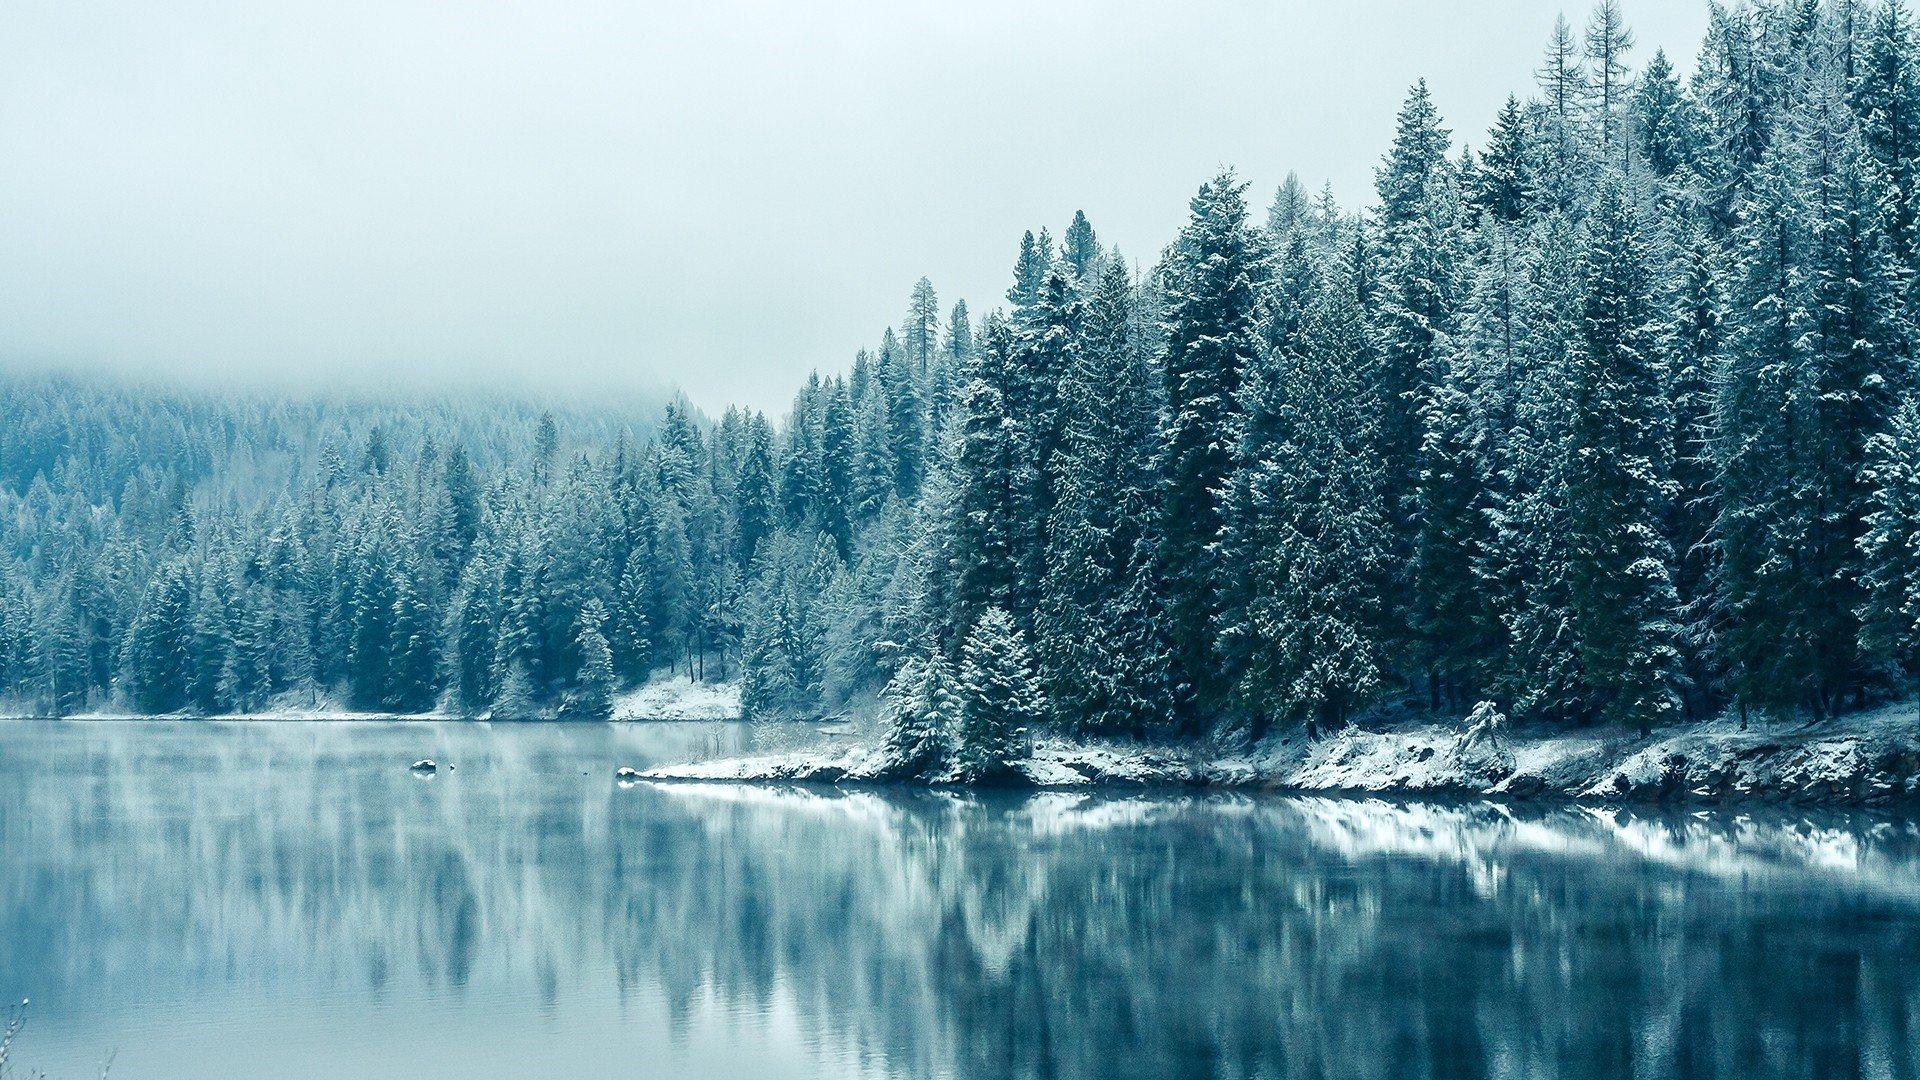 Fondos de pantalla Bosque congelado